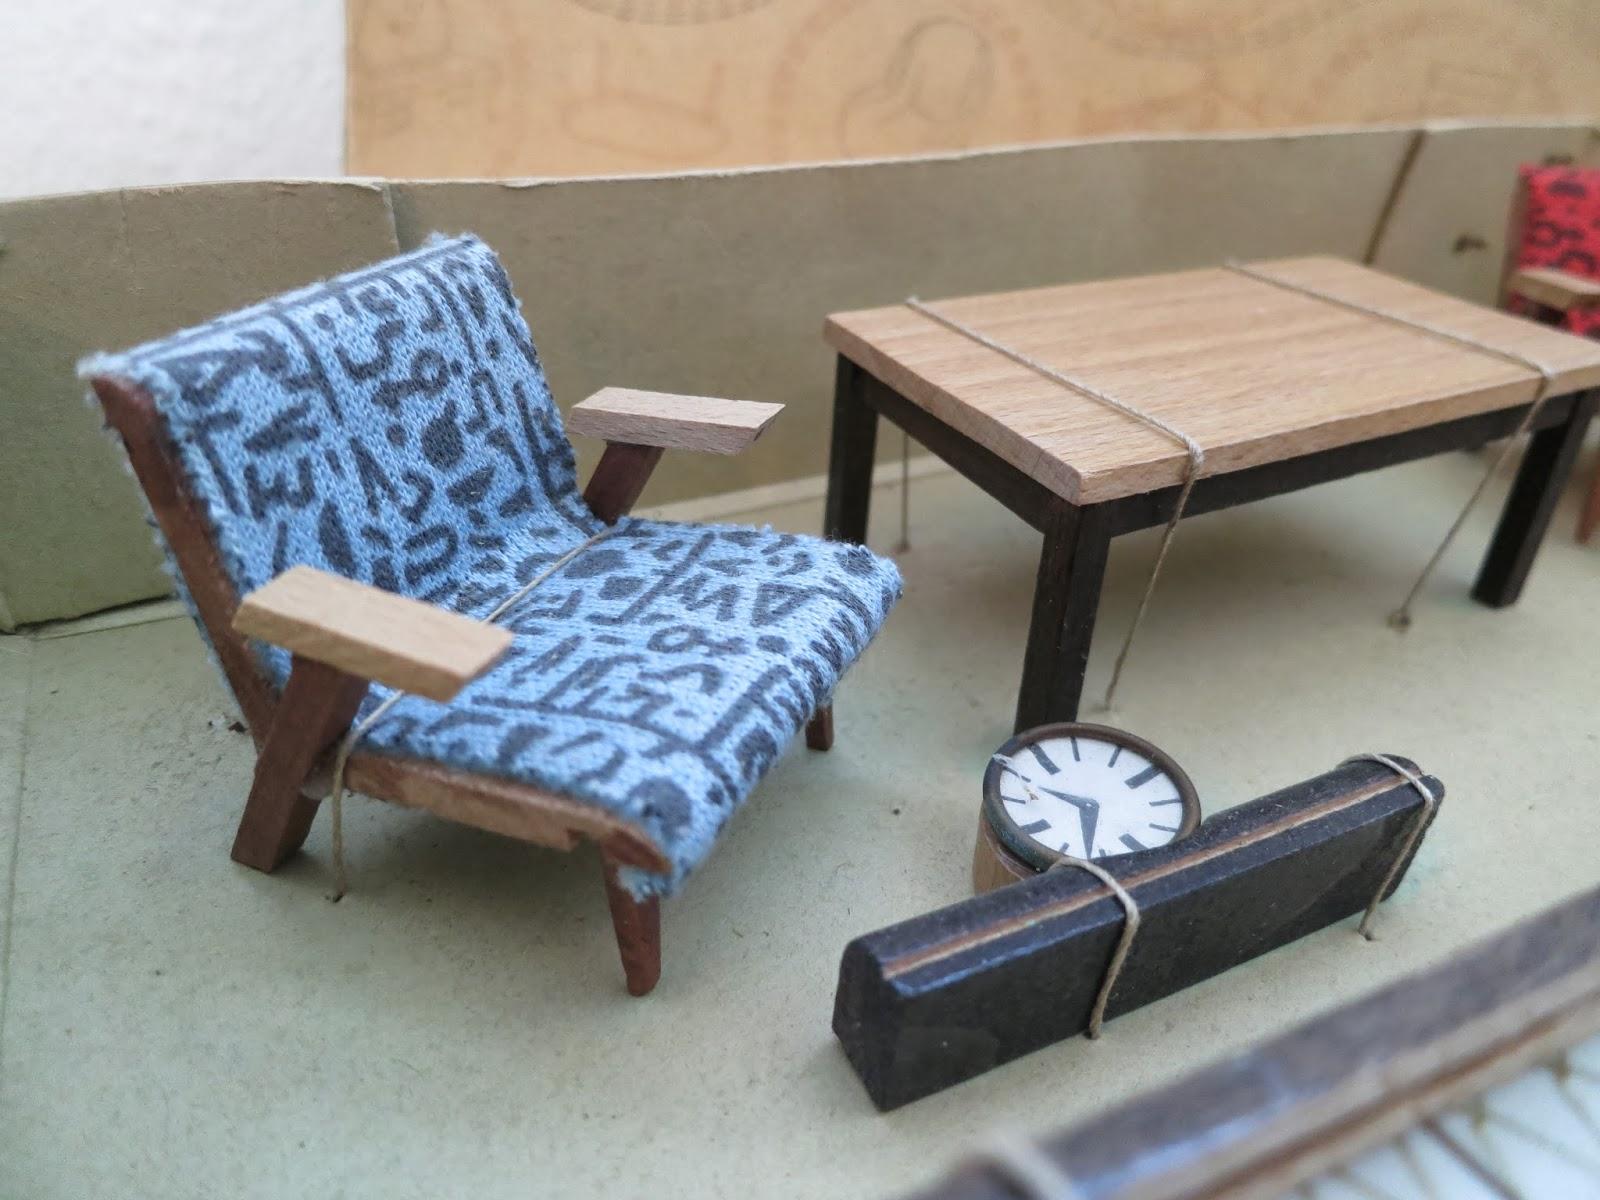 diepuppenstubensammlerin april 2015. Black Bedroom Furniture Sets. Home Design Ideas